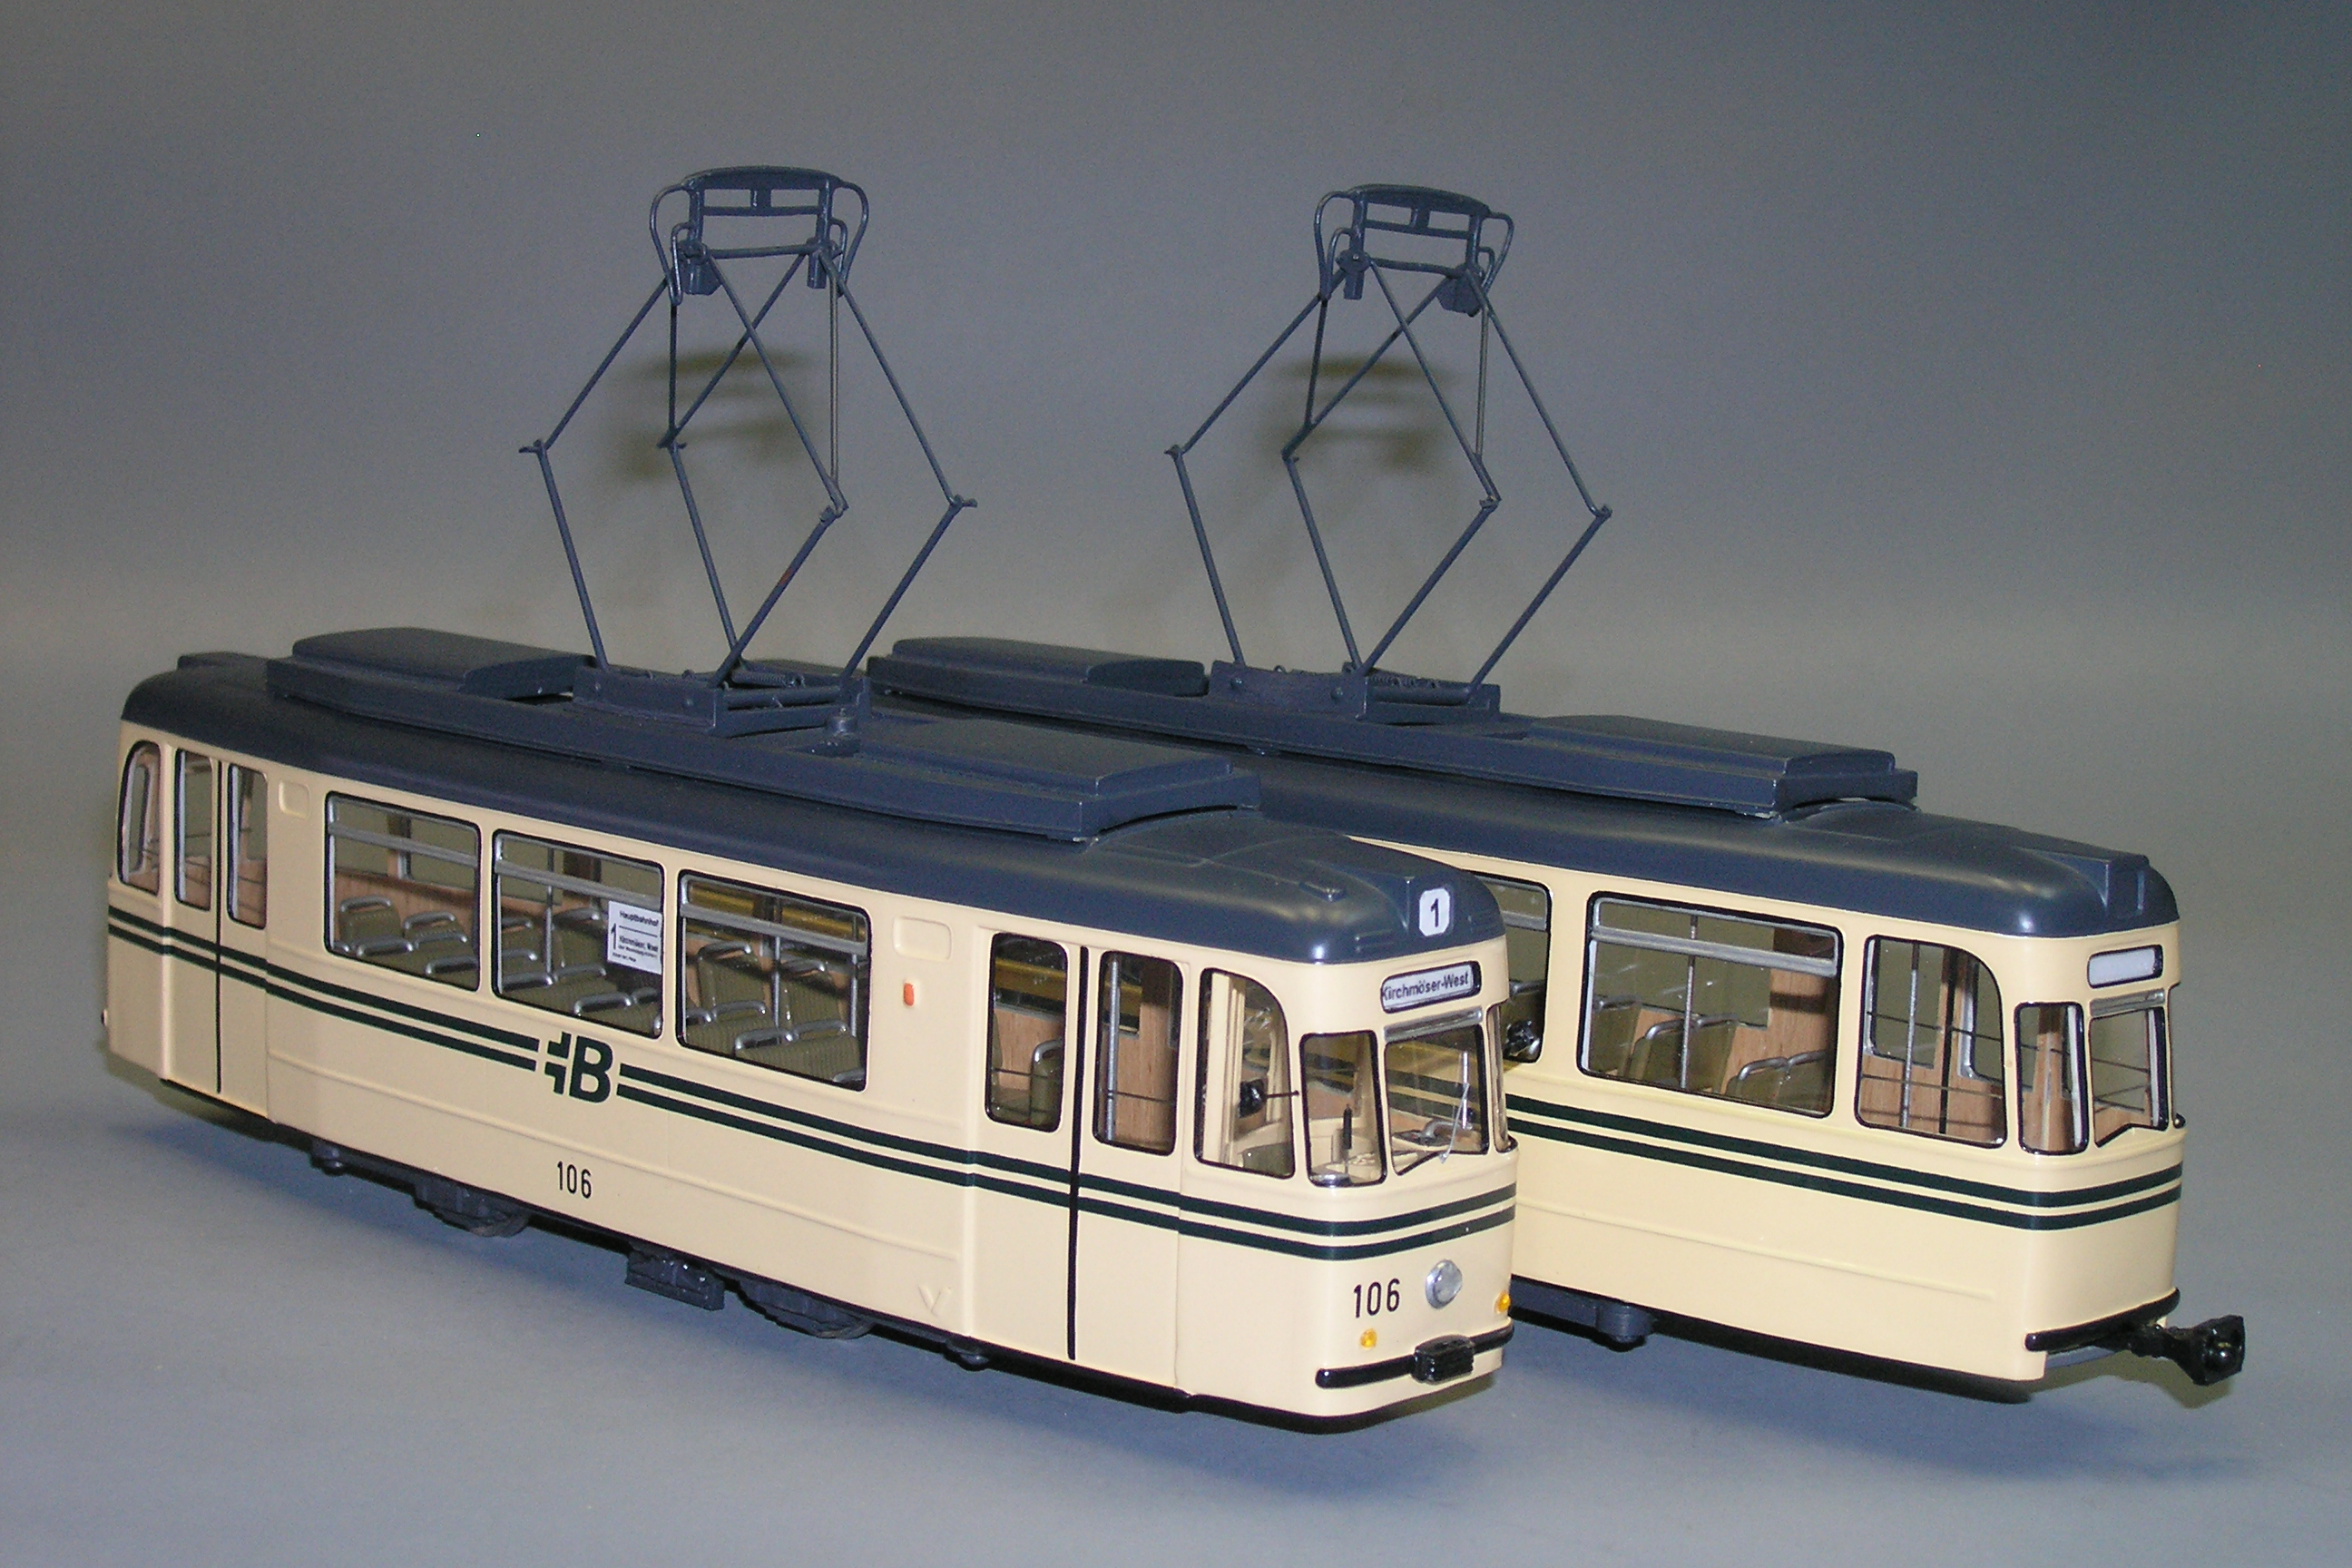 W5-98.2